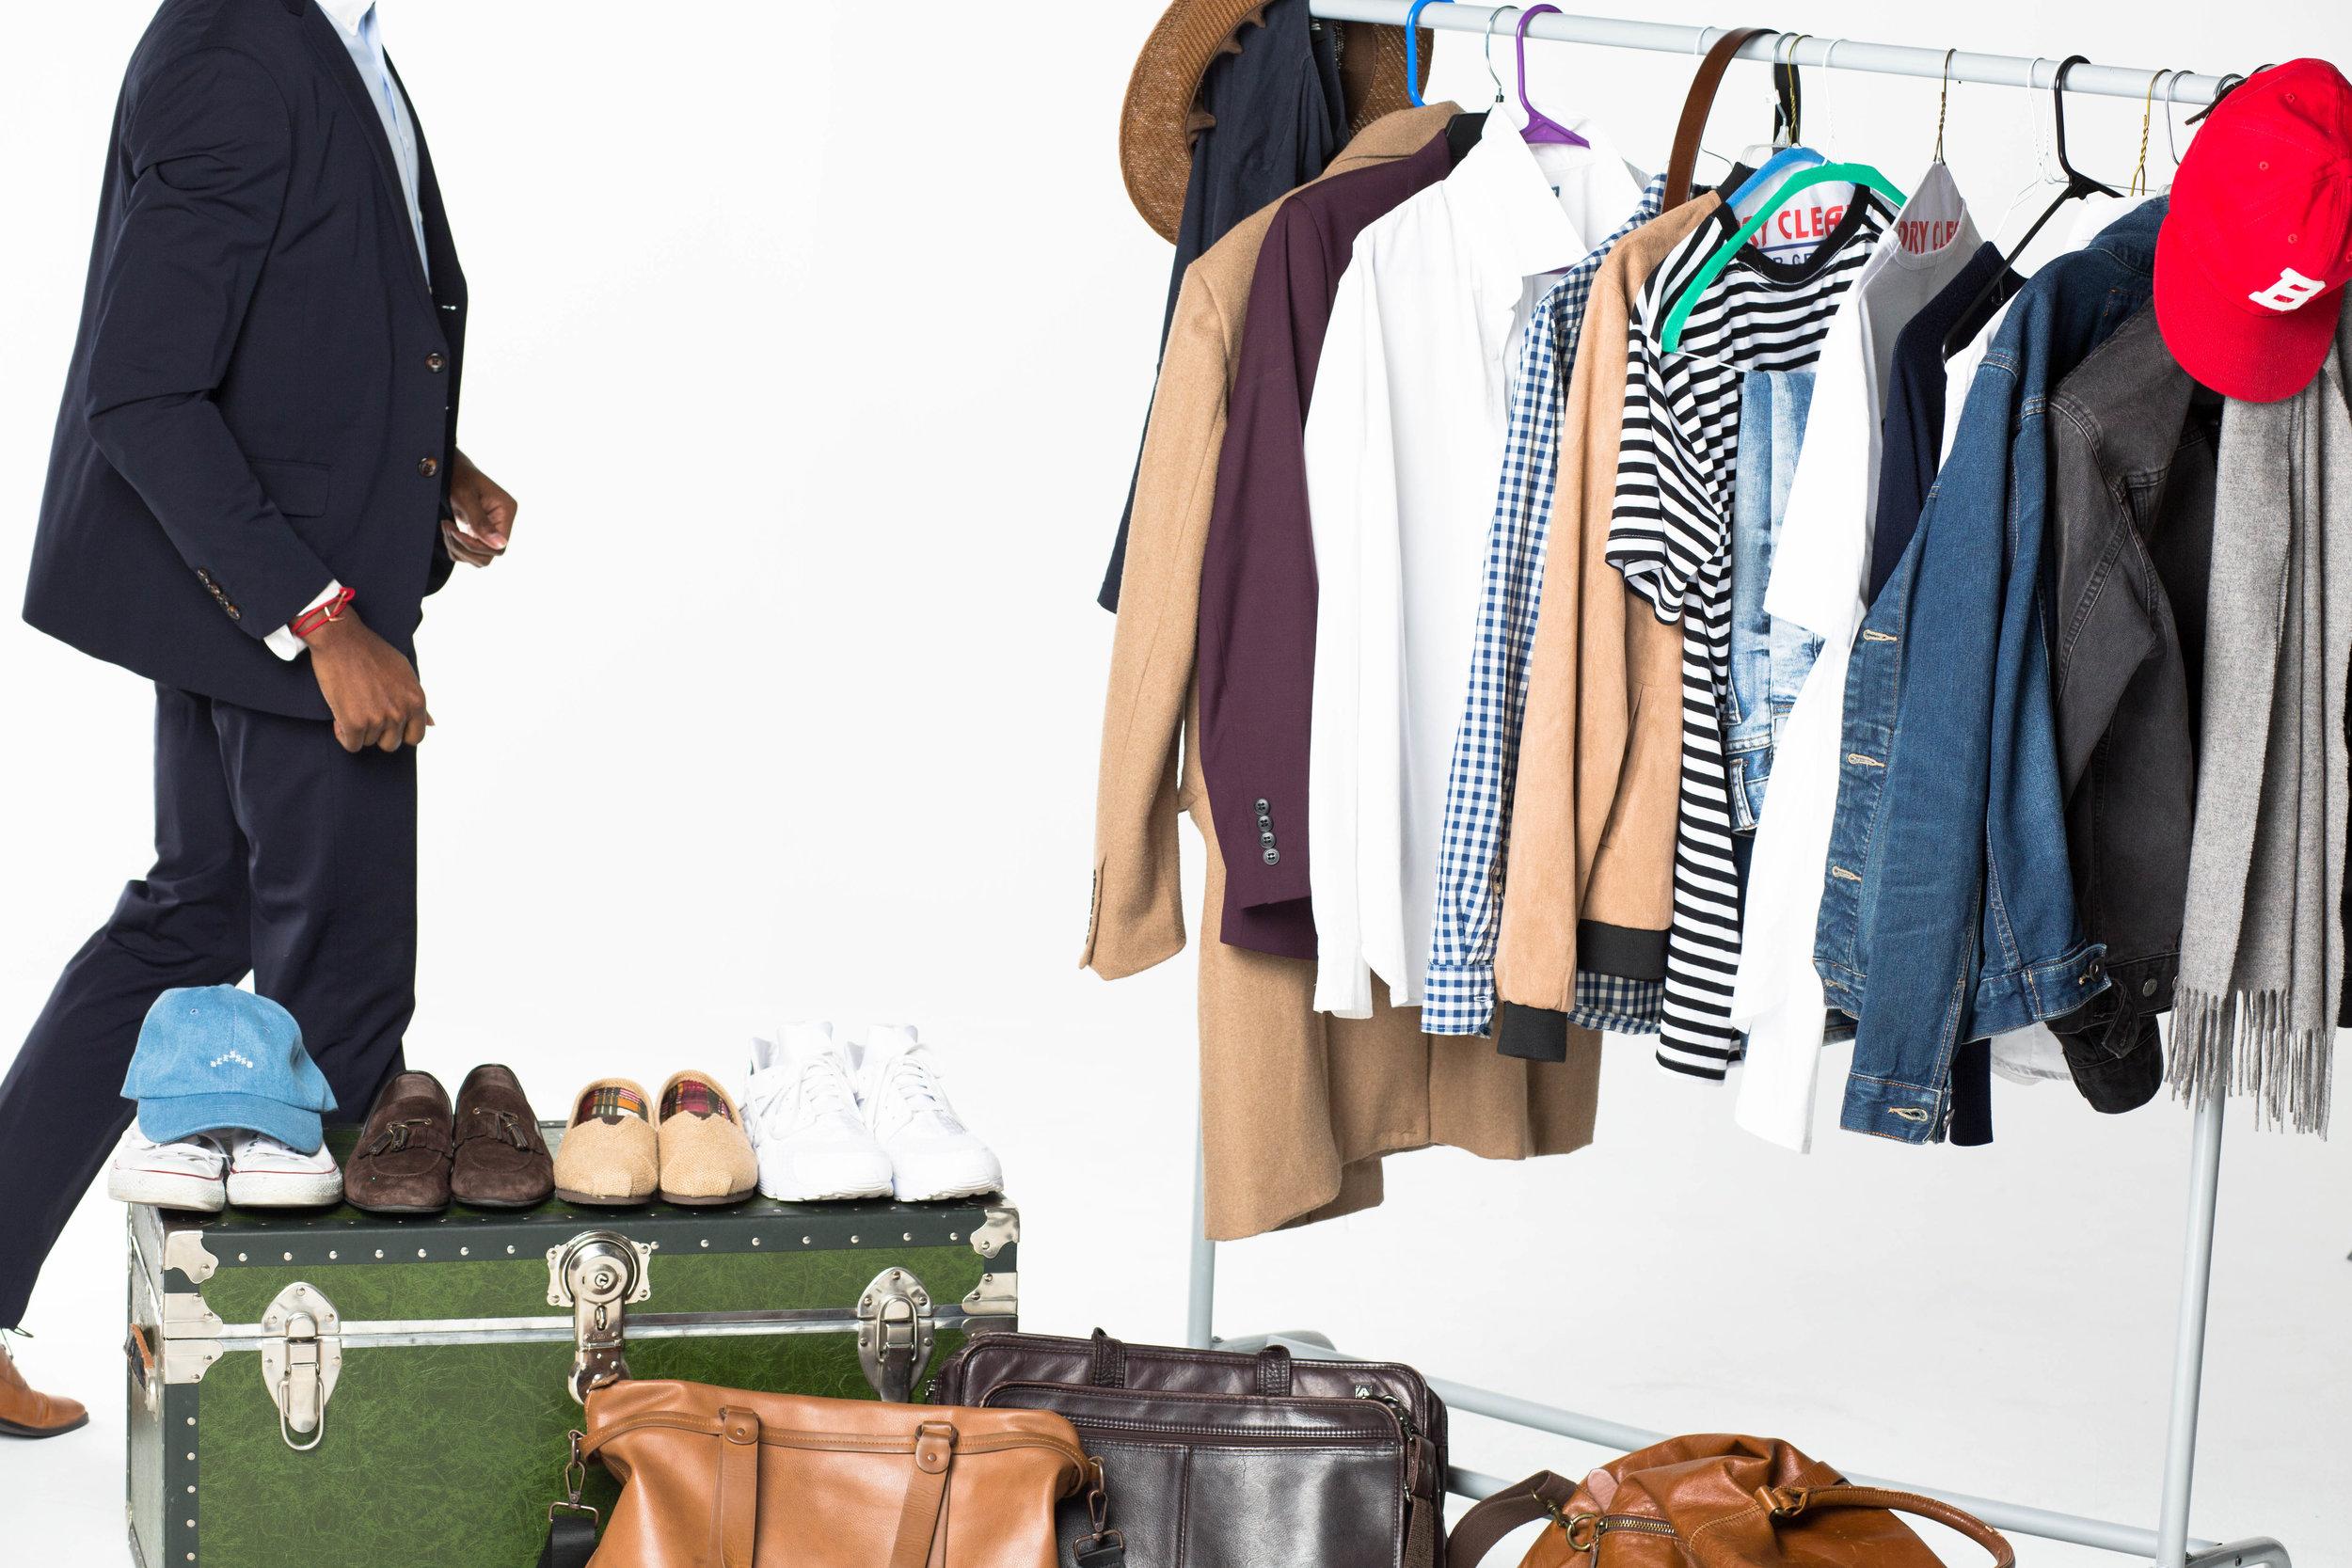 Photos courtesy of http://www.dloresphotography.com/ & http://www.blackspadez.club/